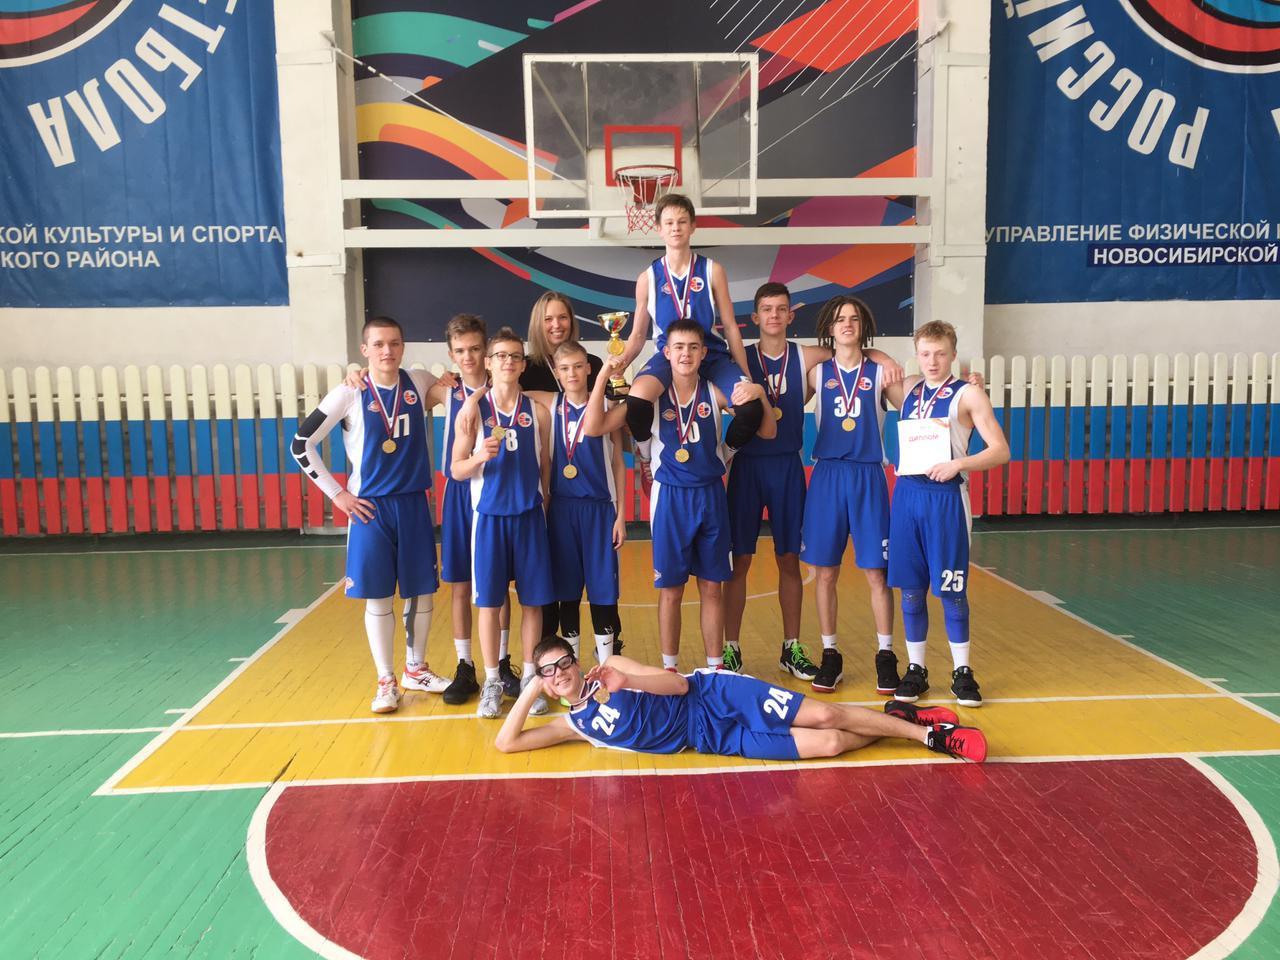 Первенство НСО по баскетболу среди юношей 2005 г.р.